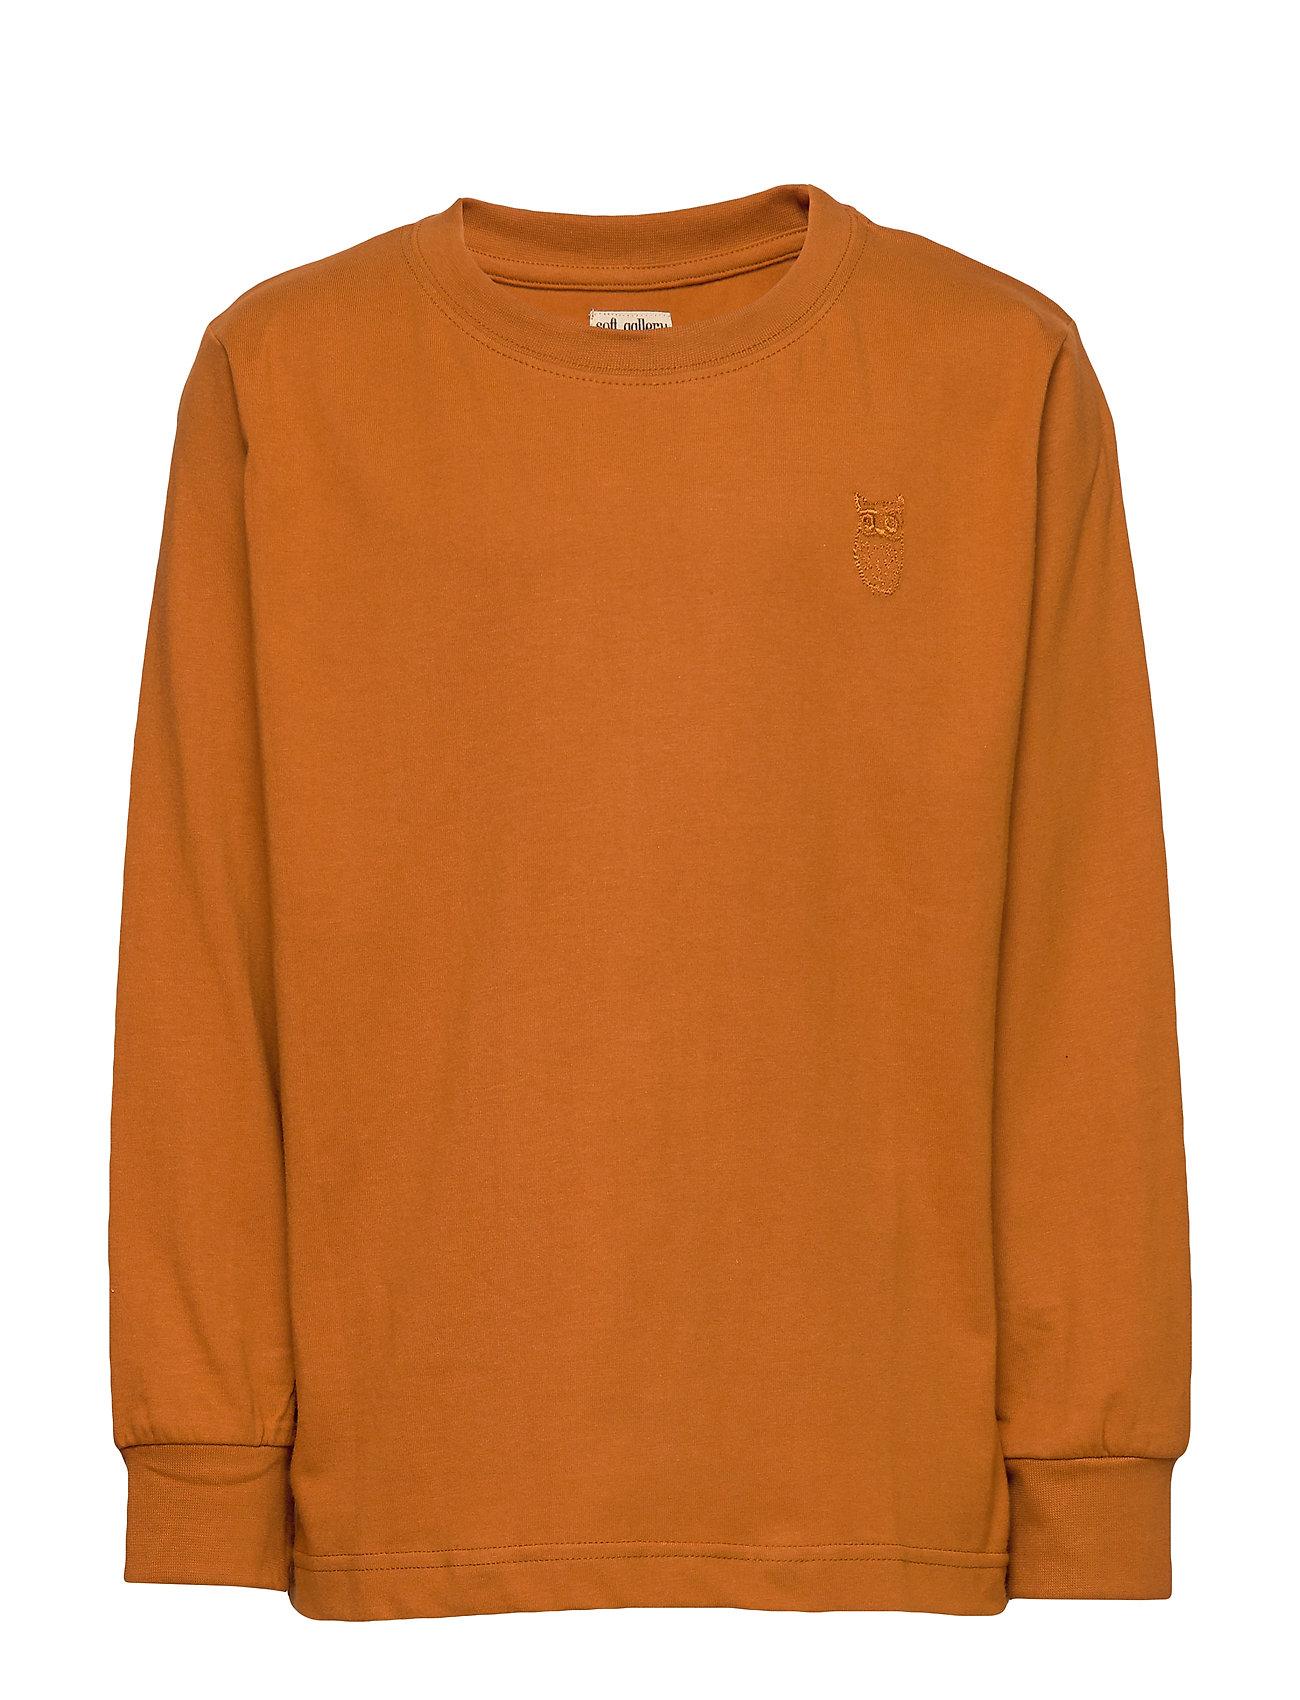 Soft Gallery Benson T-shirt - PUMPKIN SPICE, MINI OWL EMB.